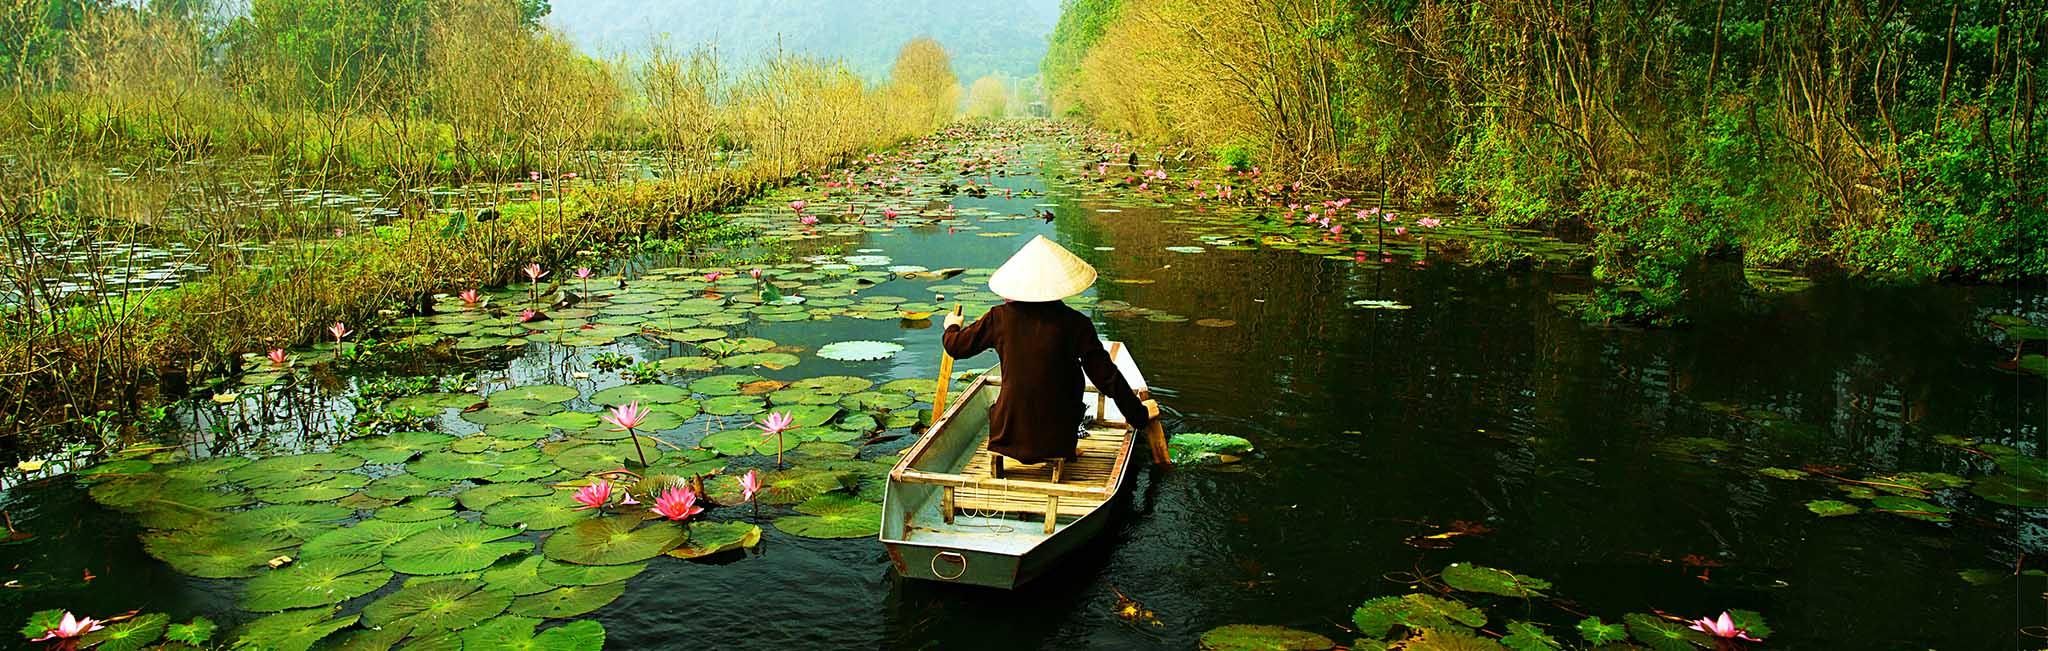 Vietnam Tour - Hanoi Yen stream on the way to Huong pagoda